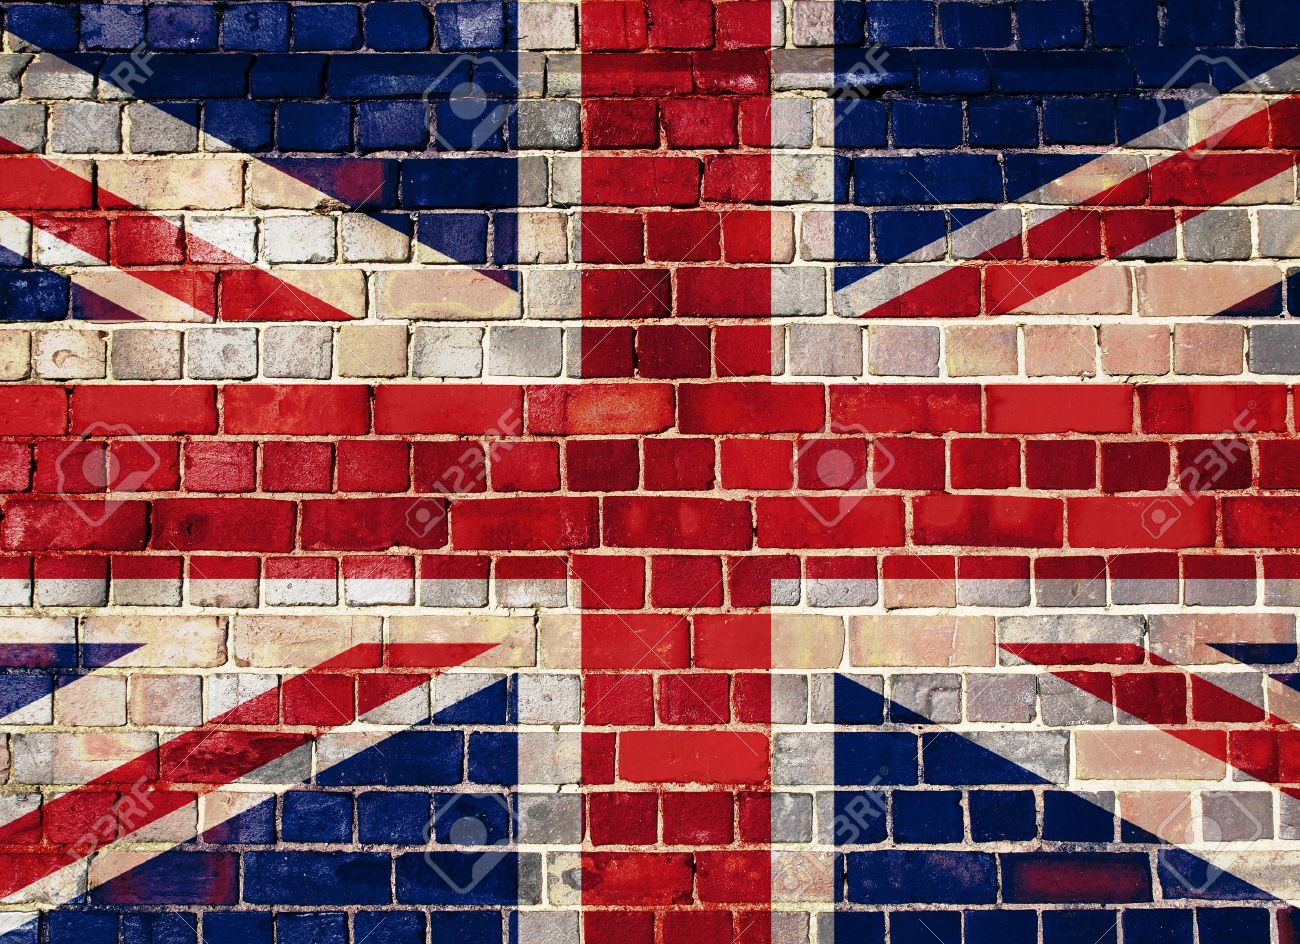 Union flag on a brick wall background - 15194918